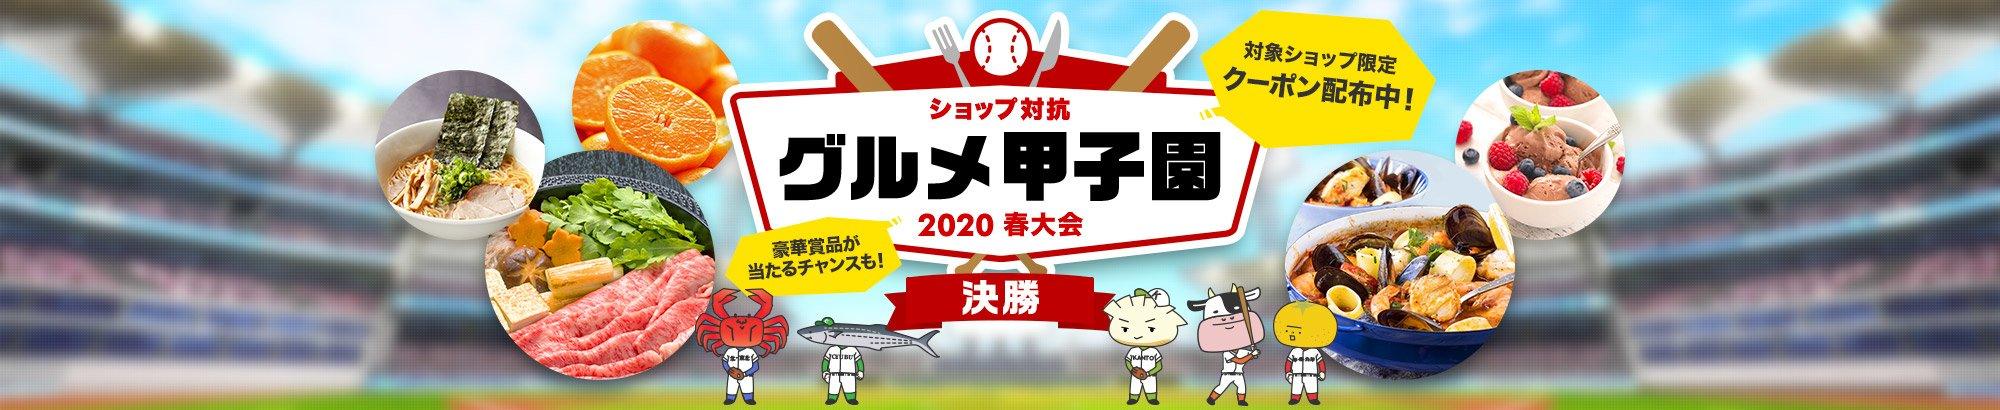 グルメ甲子園2020春大会   決勝